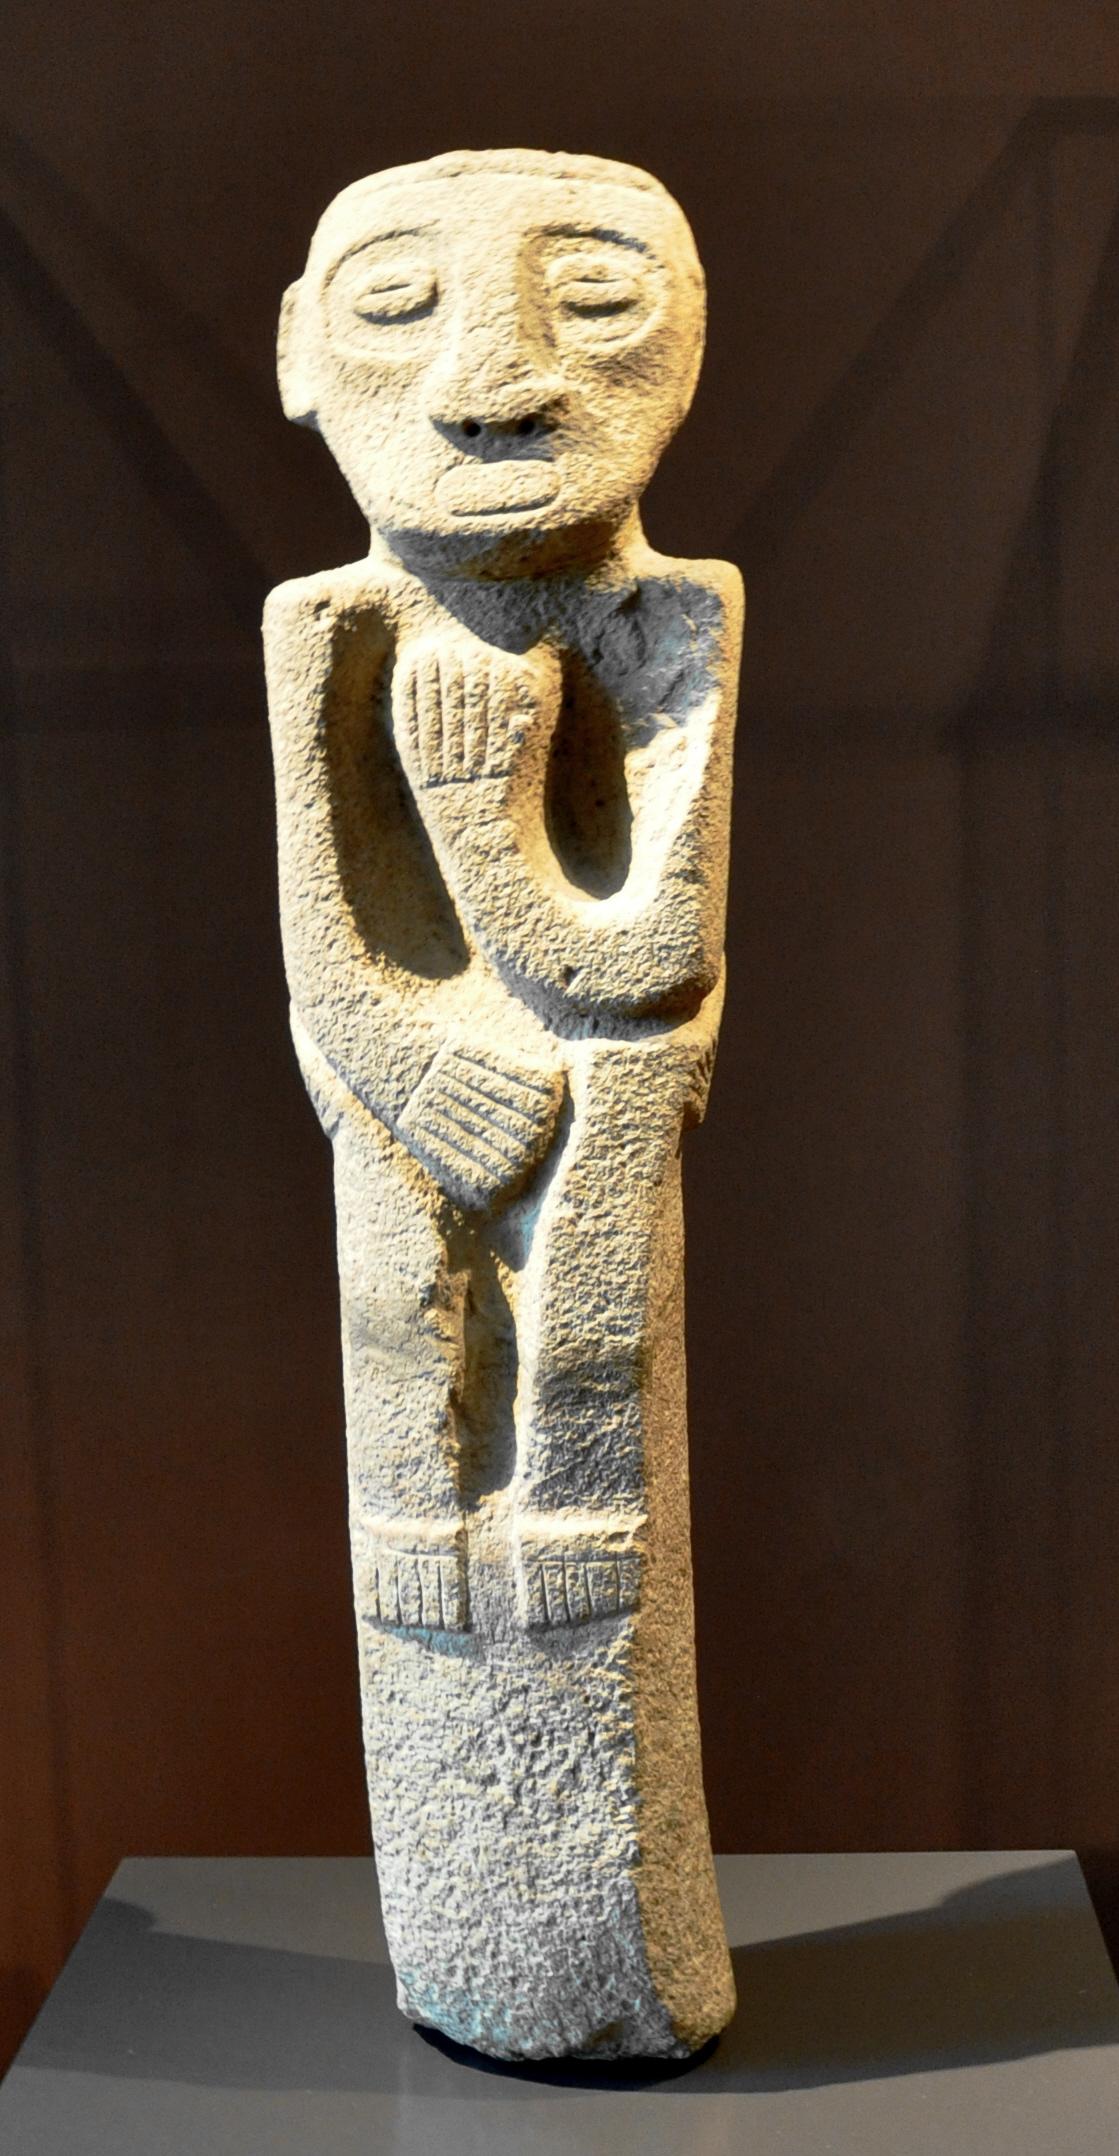 Mensch mit Schutzgeist Panama Museum Rietberg RMA 803.jpg